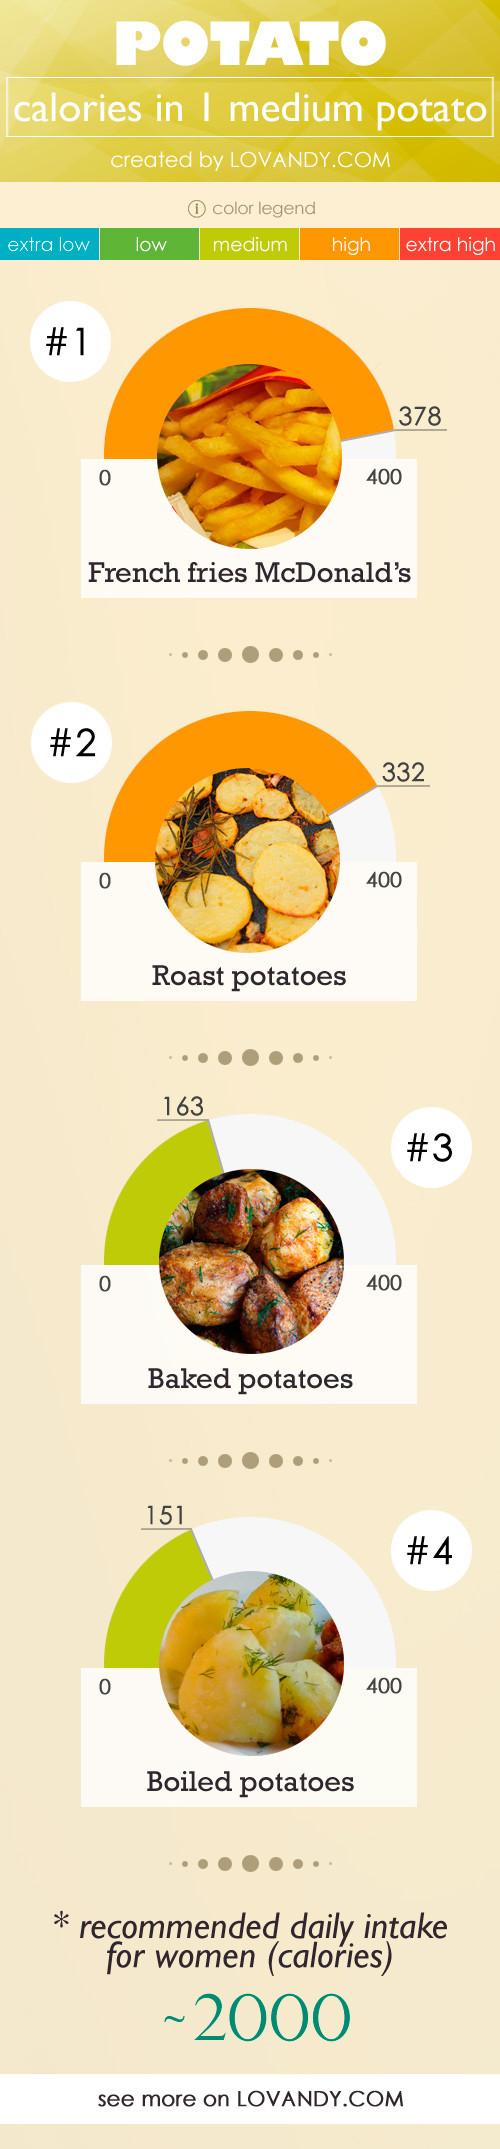 Calories In Medium Potato  Potato Calories Baked Mashed Roast per 1 potato 100g